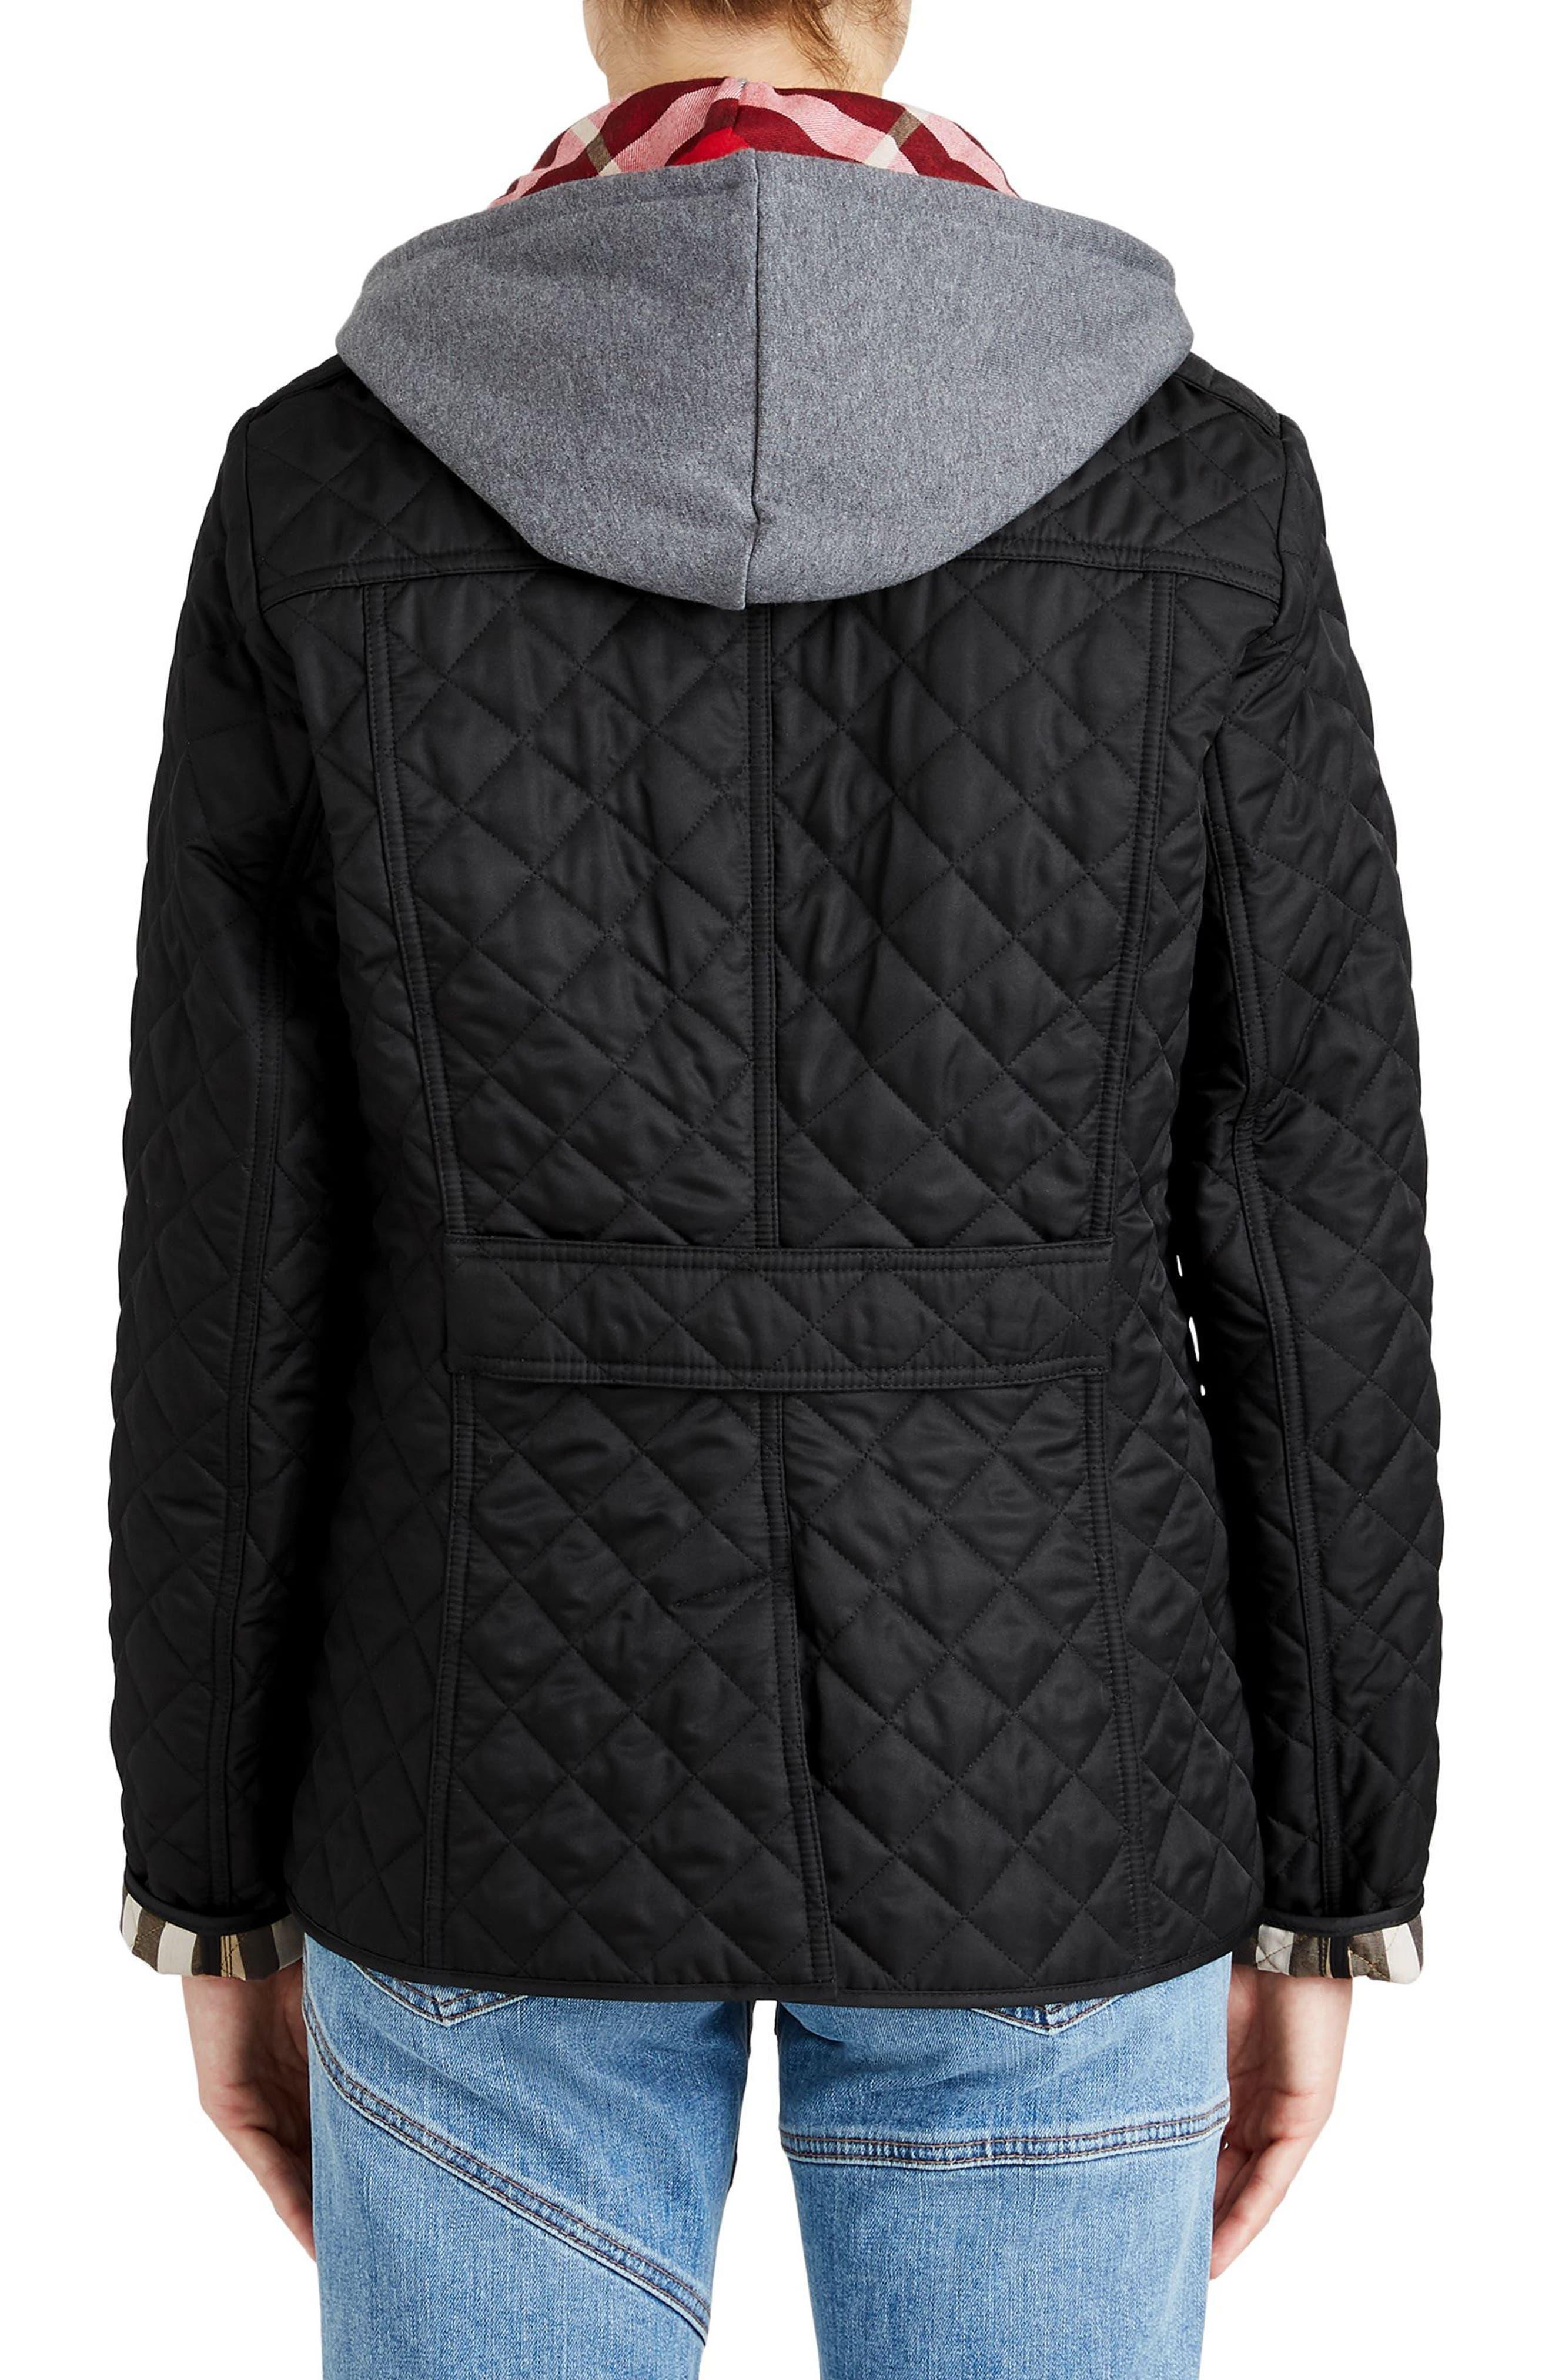 Ashurst Quilted Jacket,                             Alternate thumbnail 2, color,                             BLACK